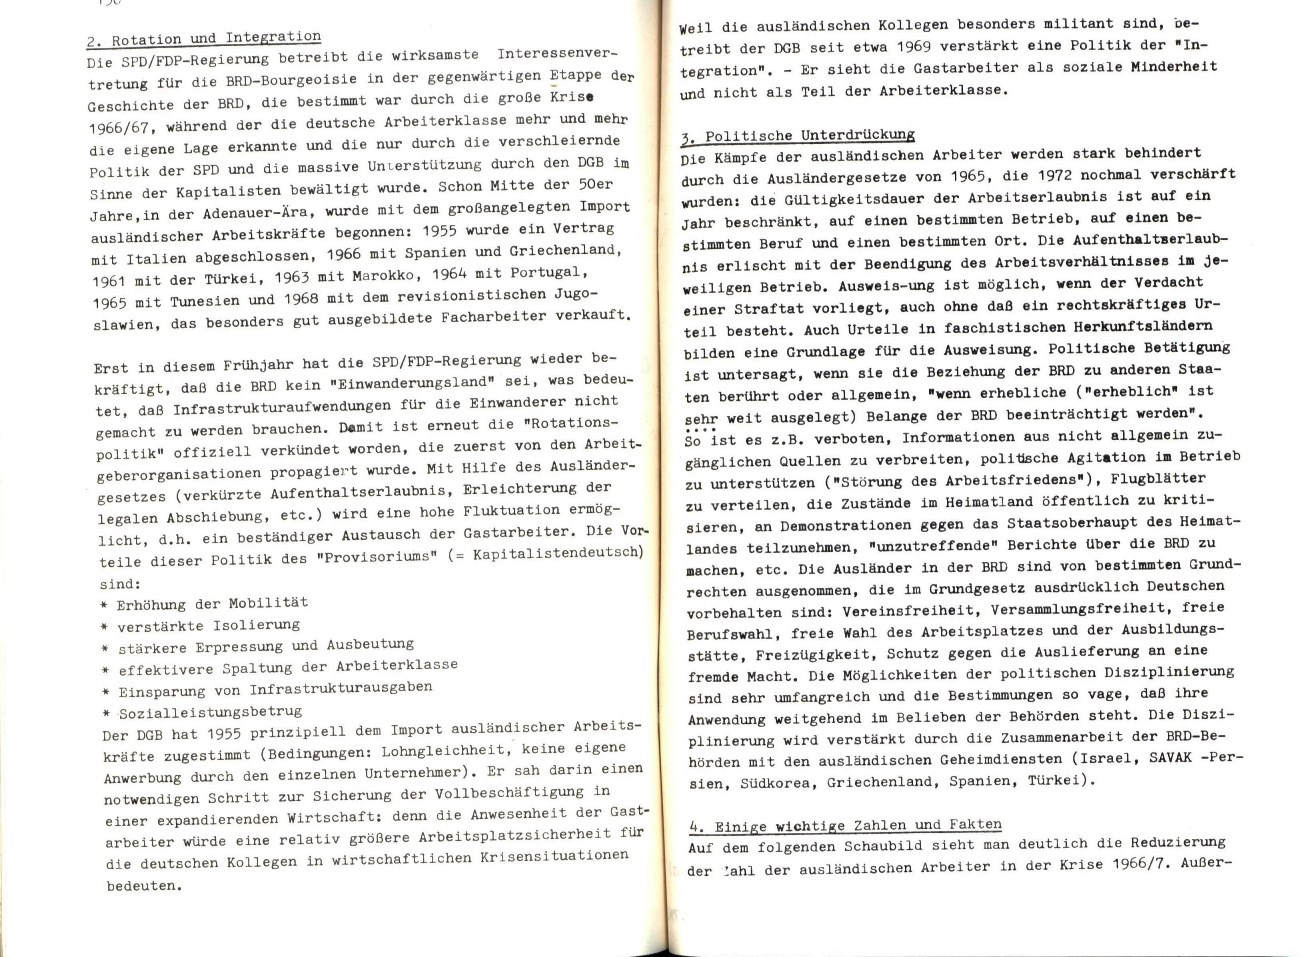 Bochum_IGM_Opel_PG_Opel_streikt_1973_078